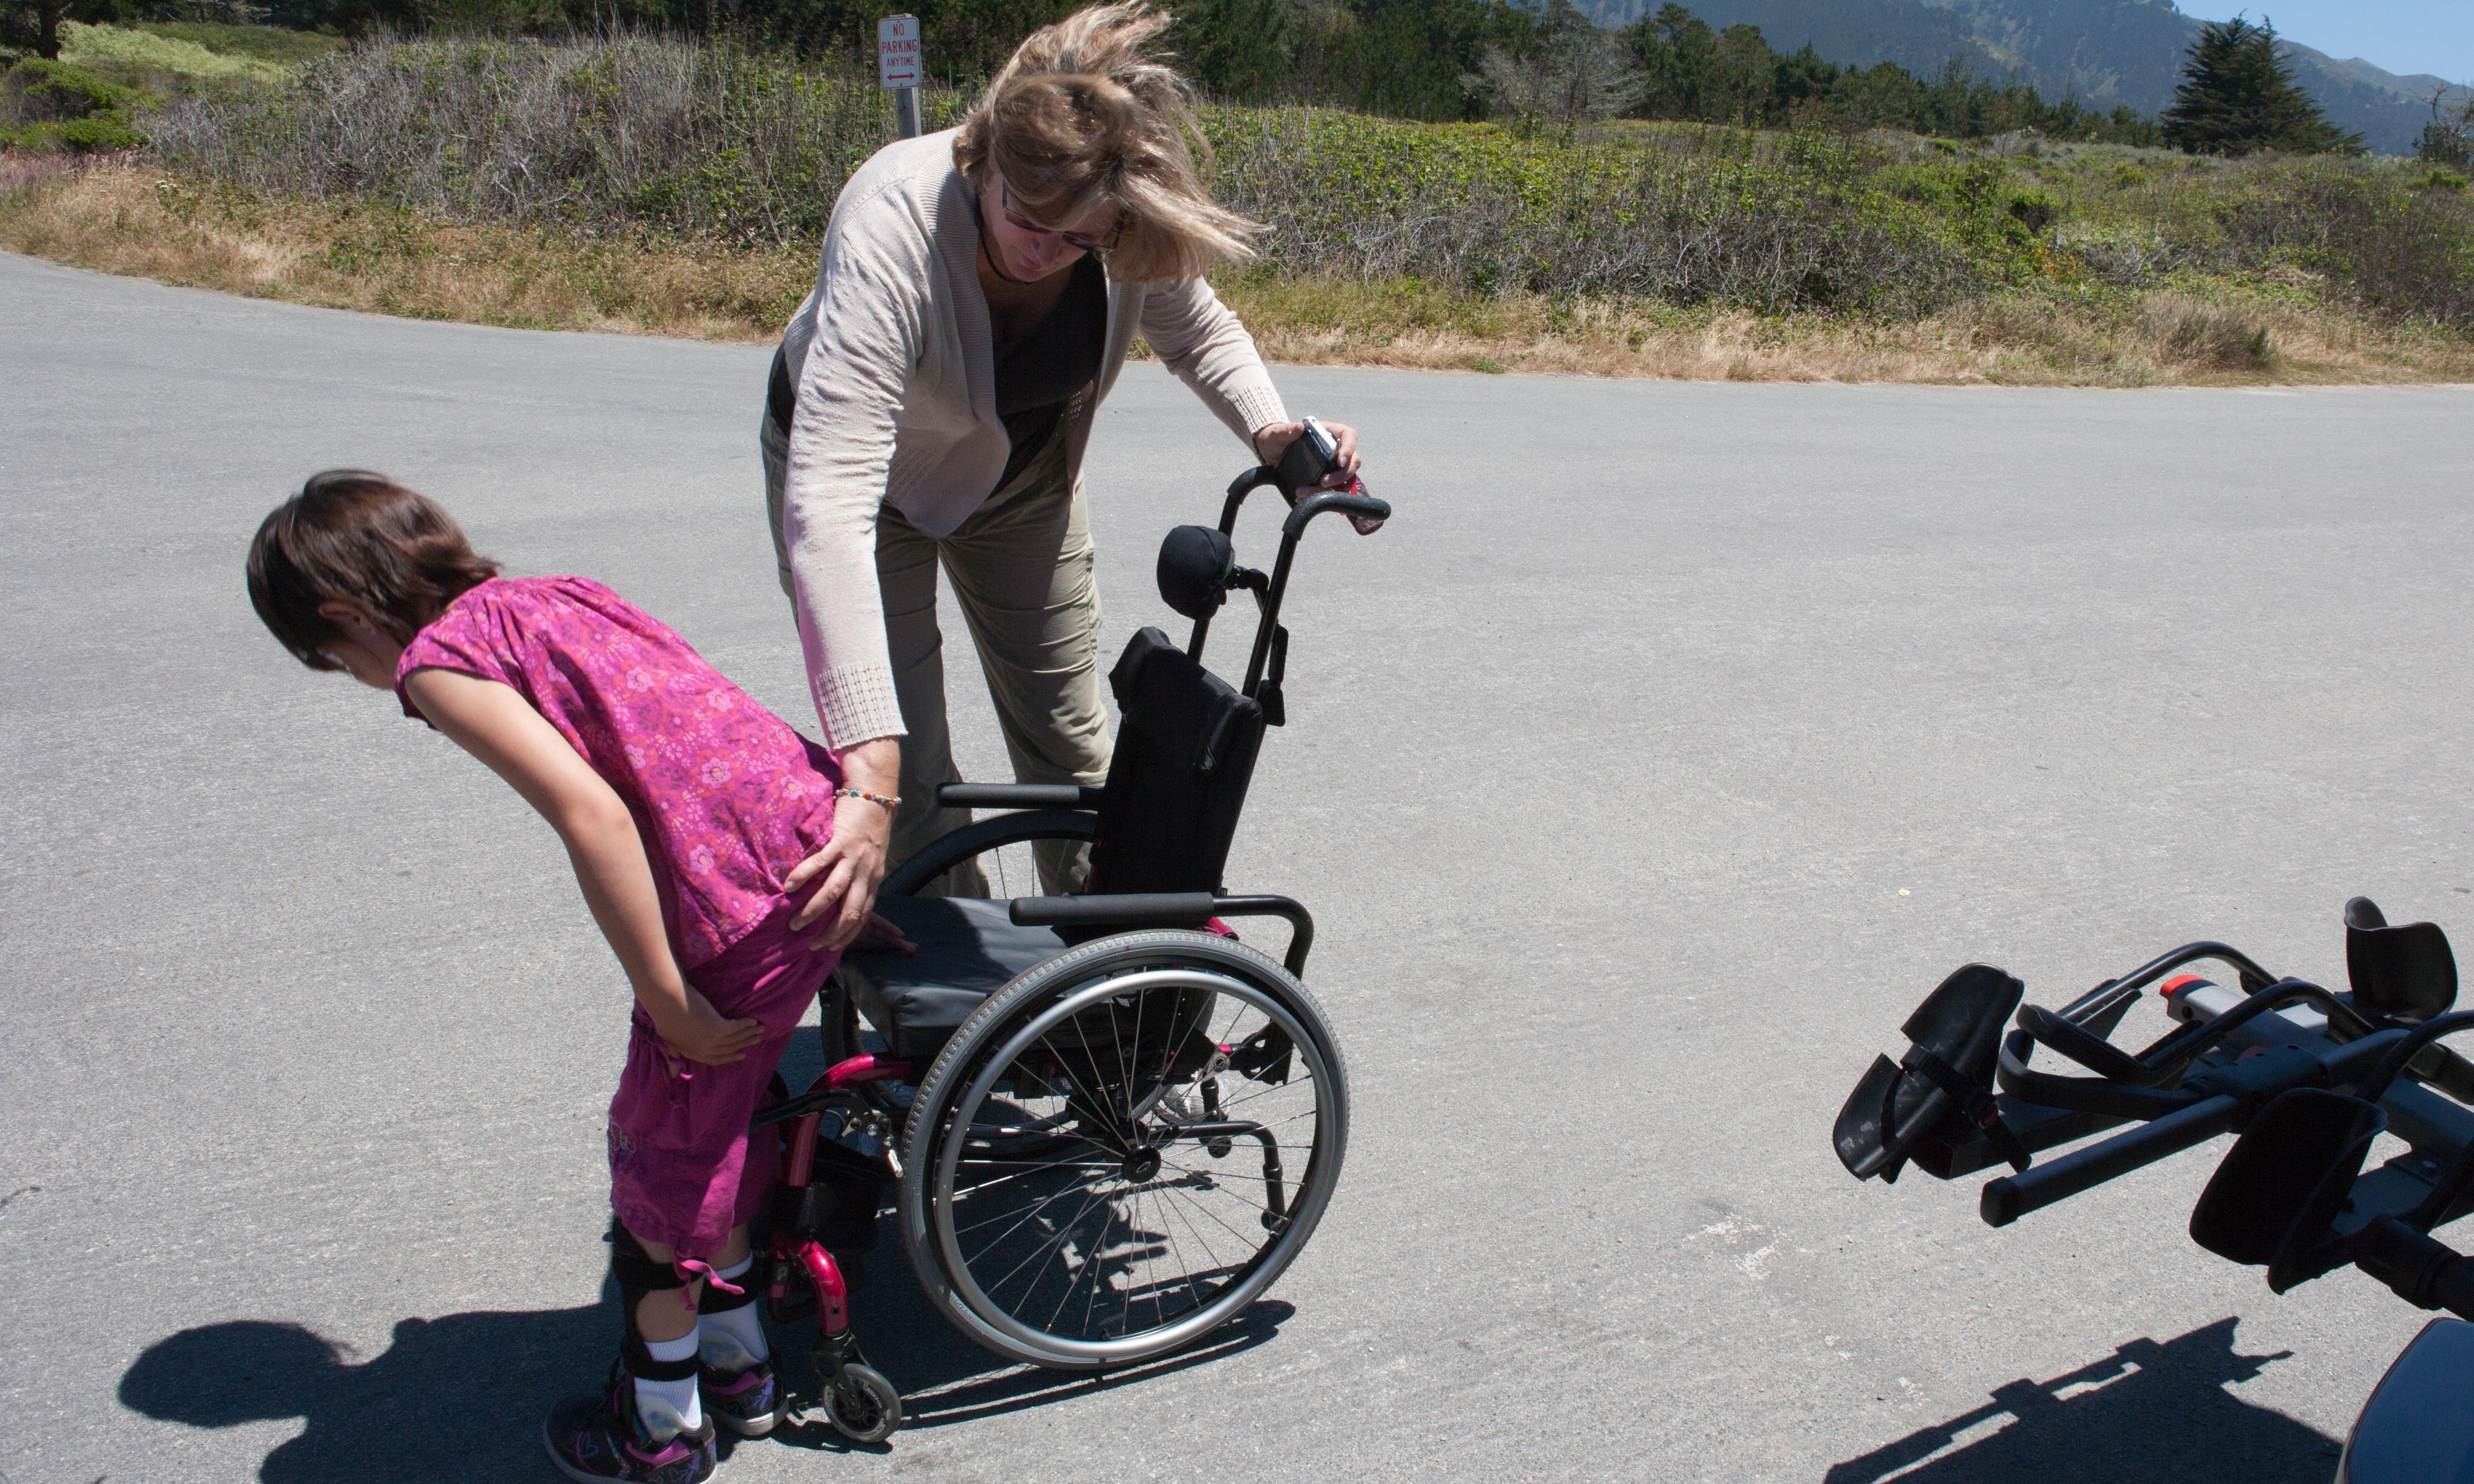 Doctors hail breakthrough in muscular dystrophy treatment